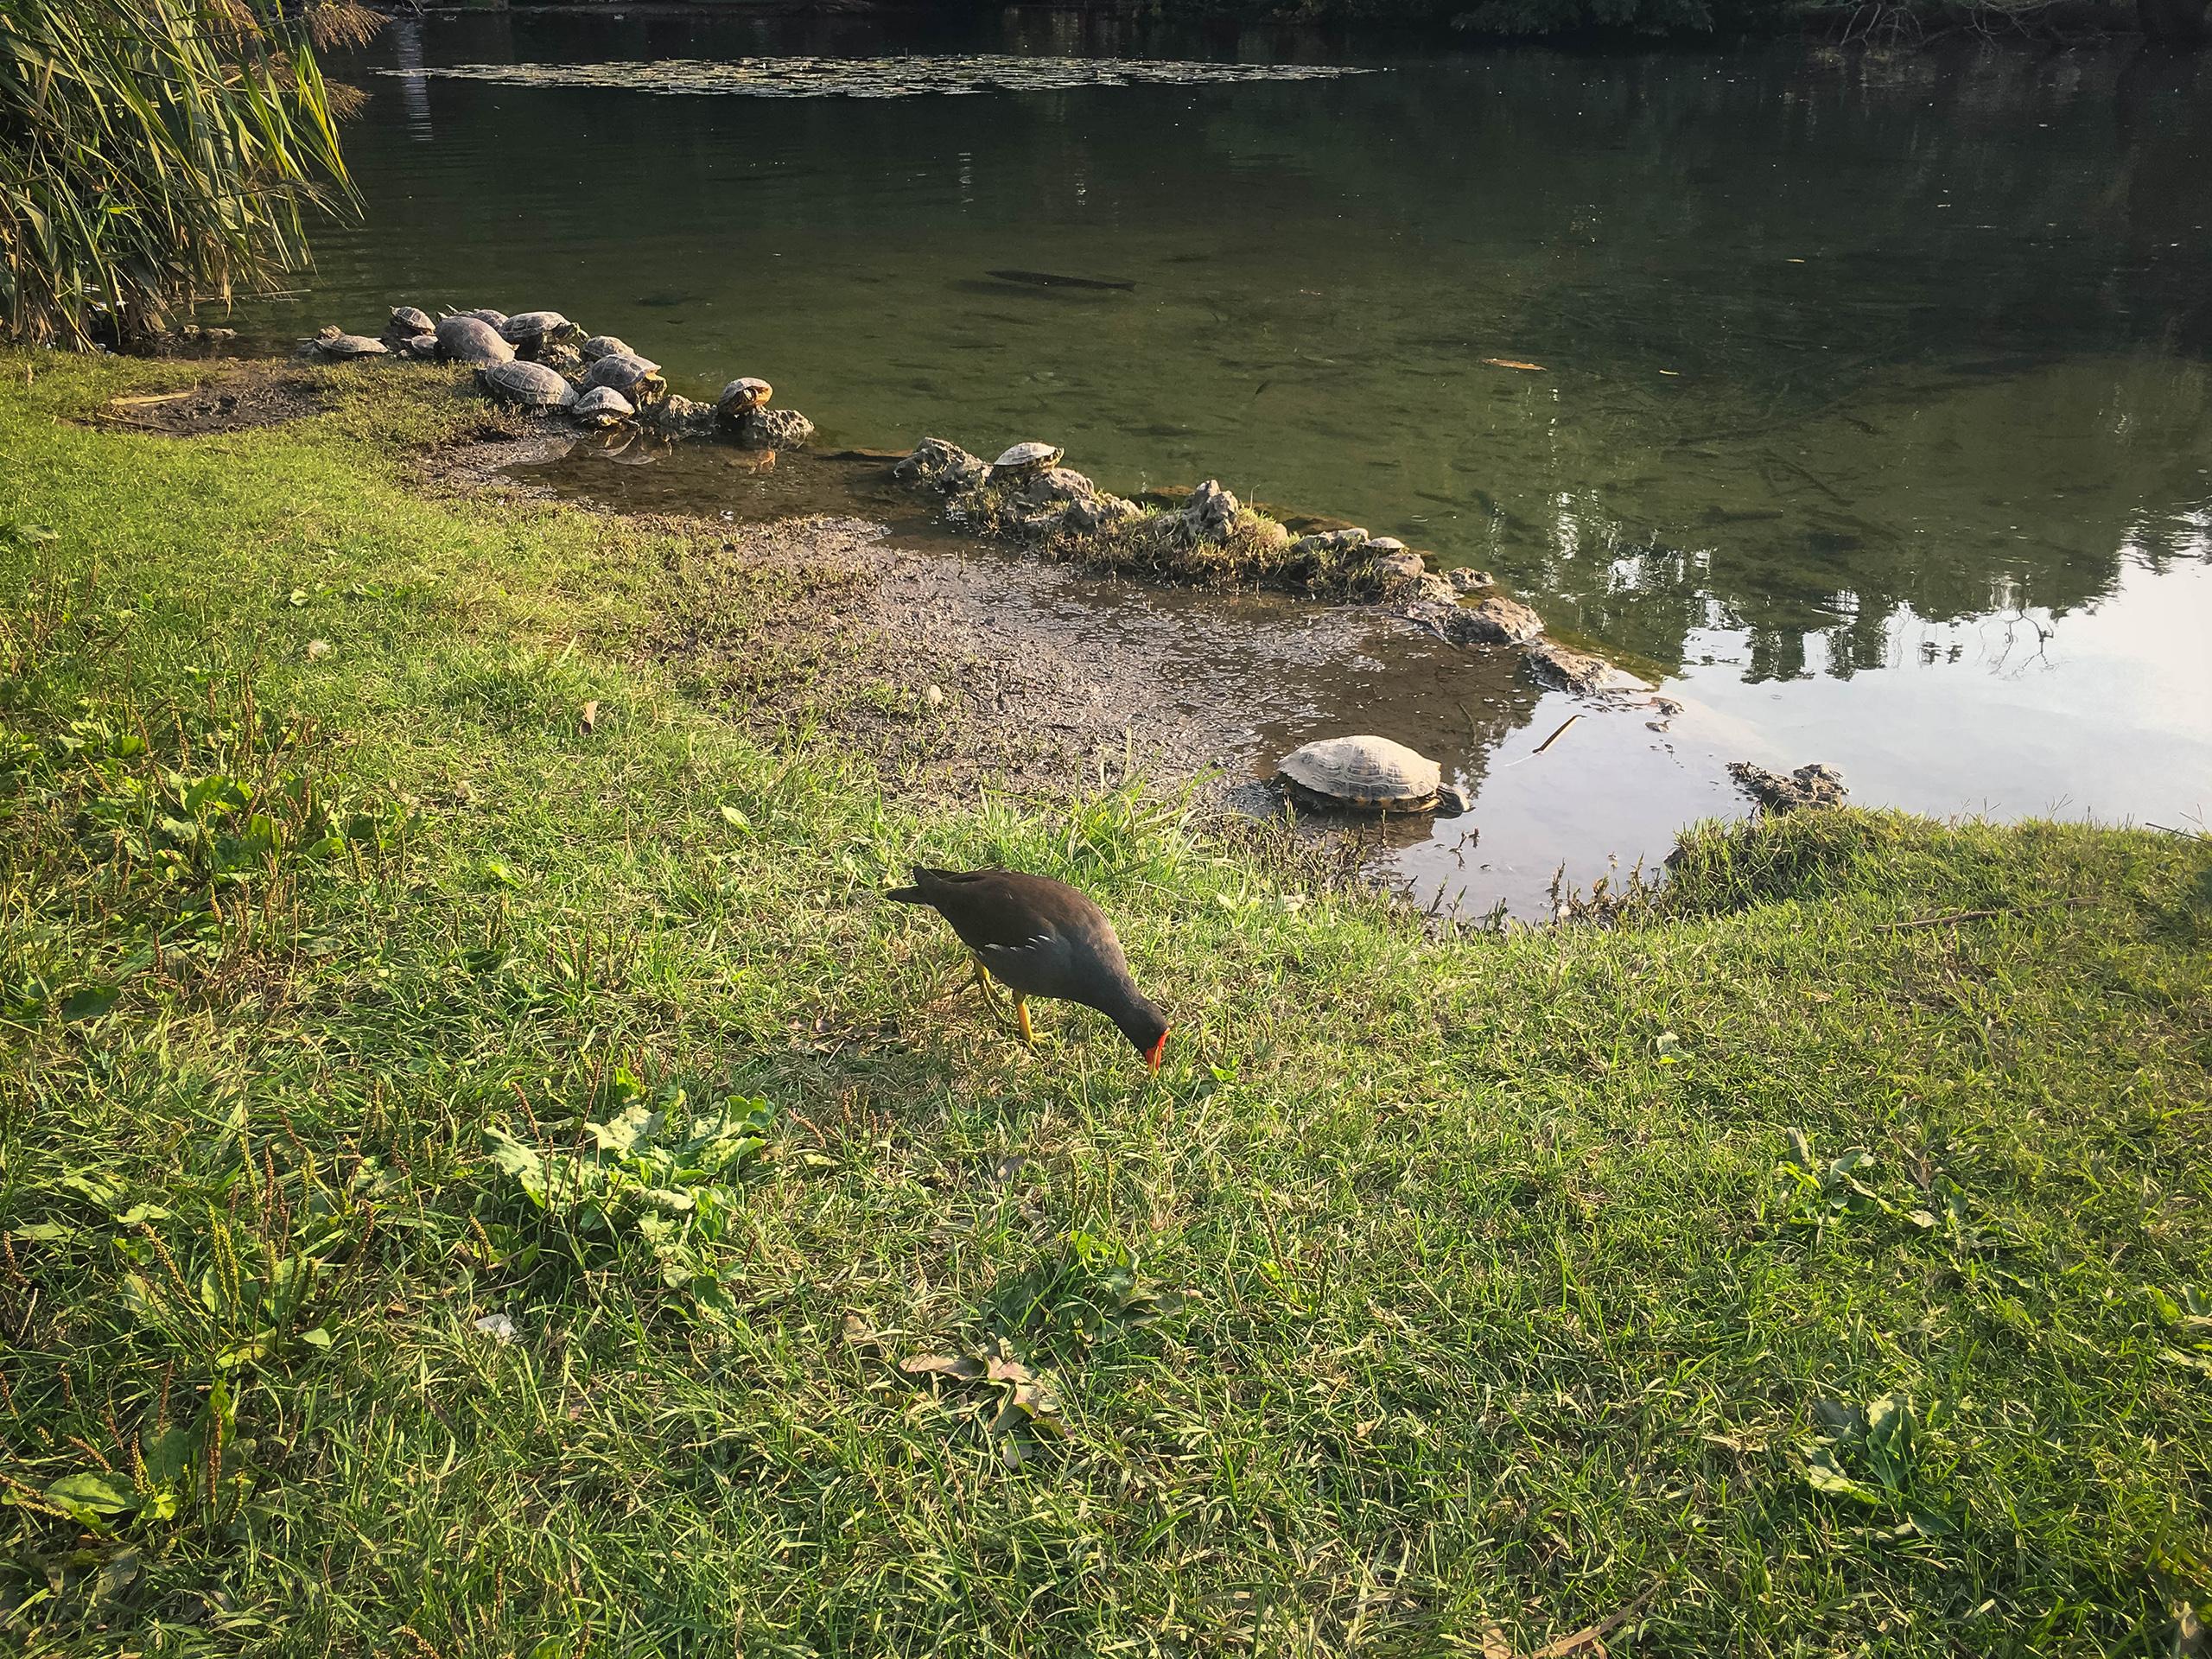 milan park sempione turtles